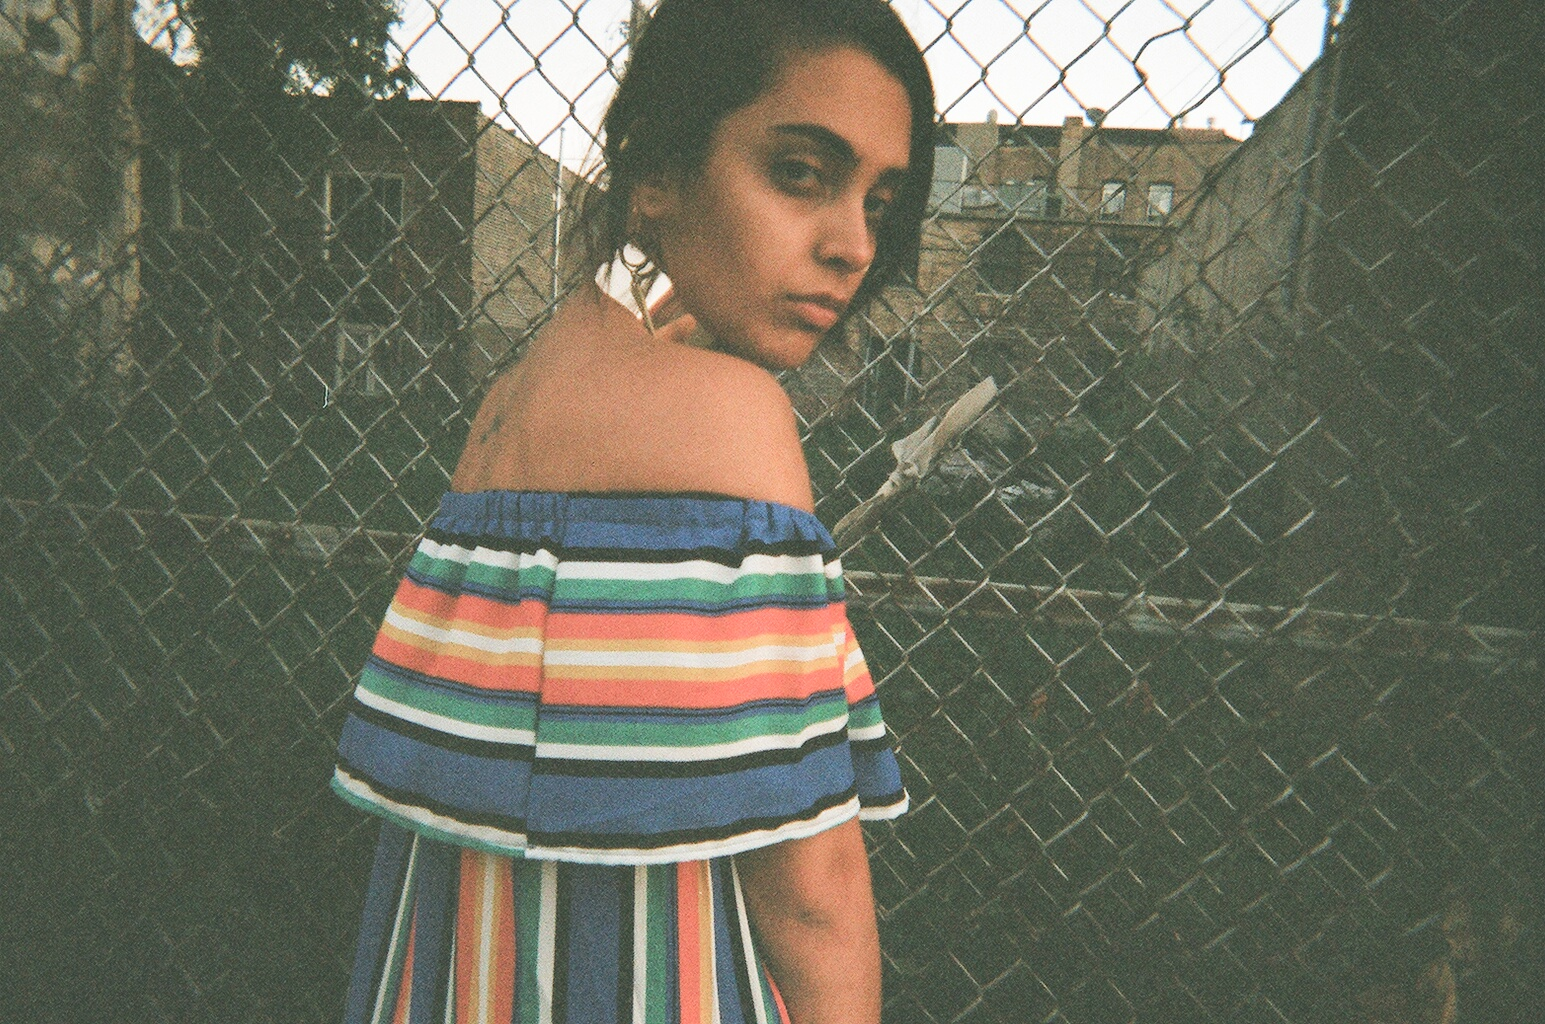 shein clothing, fashion blogger